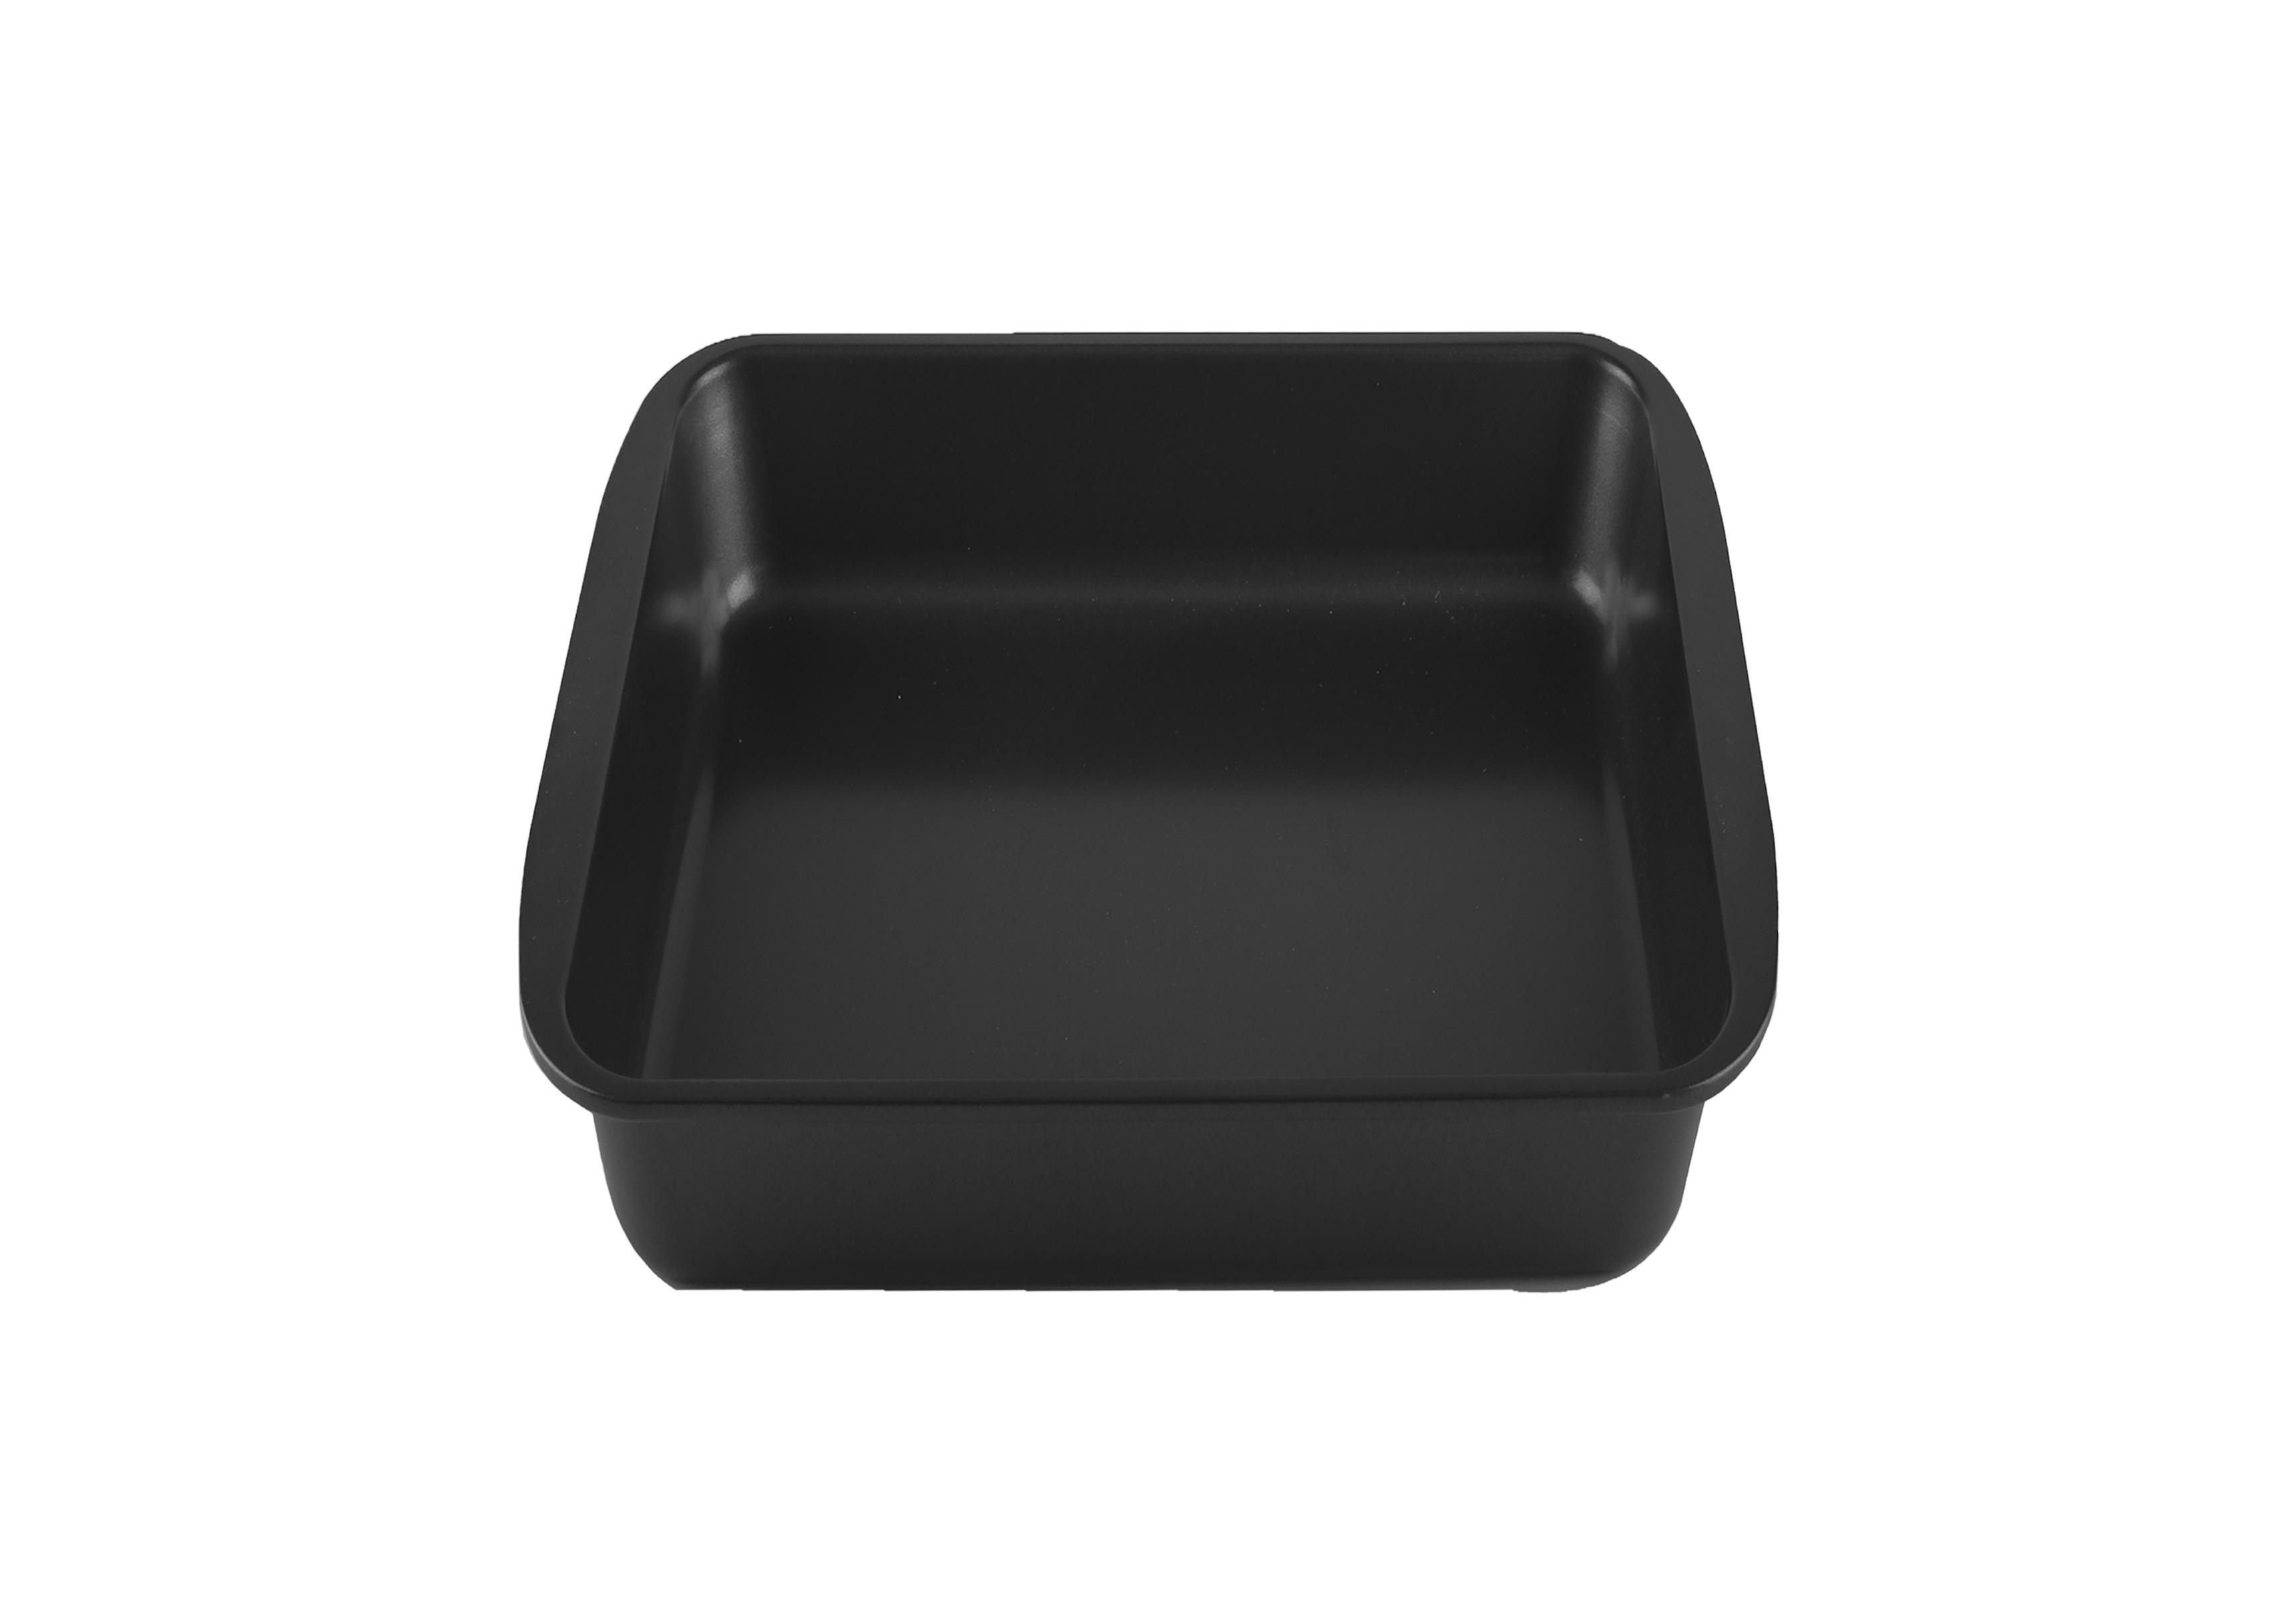 BKW-M-0022-D - Square Cake Pan 23cm